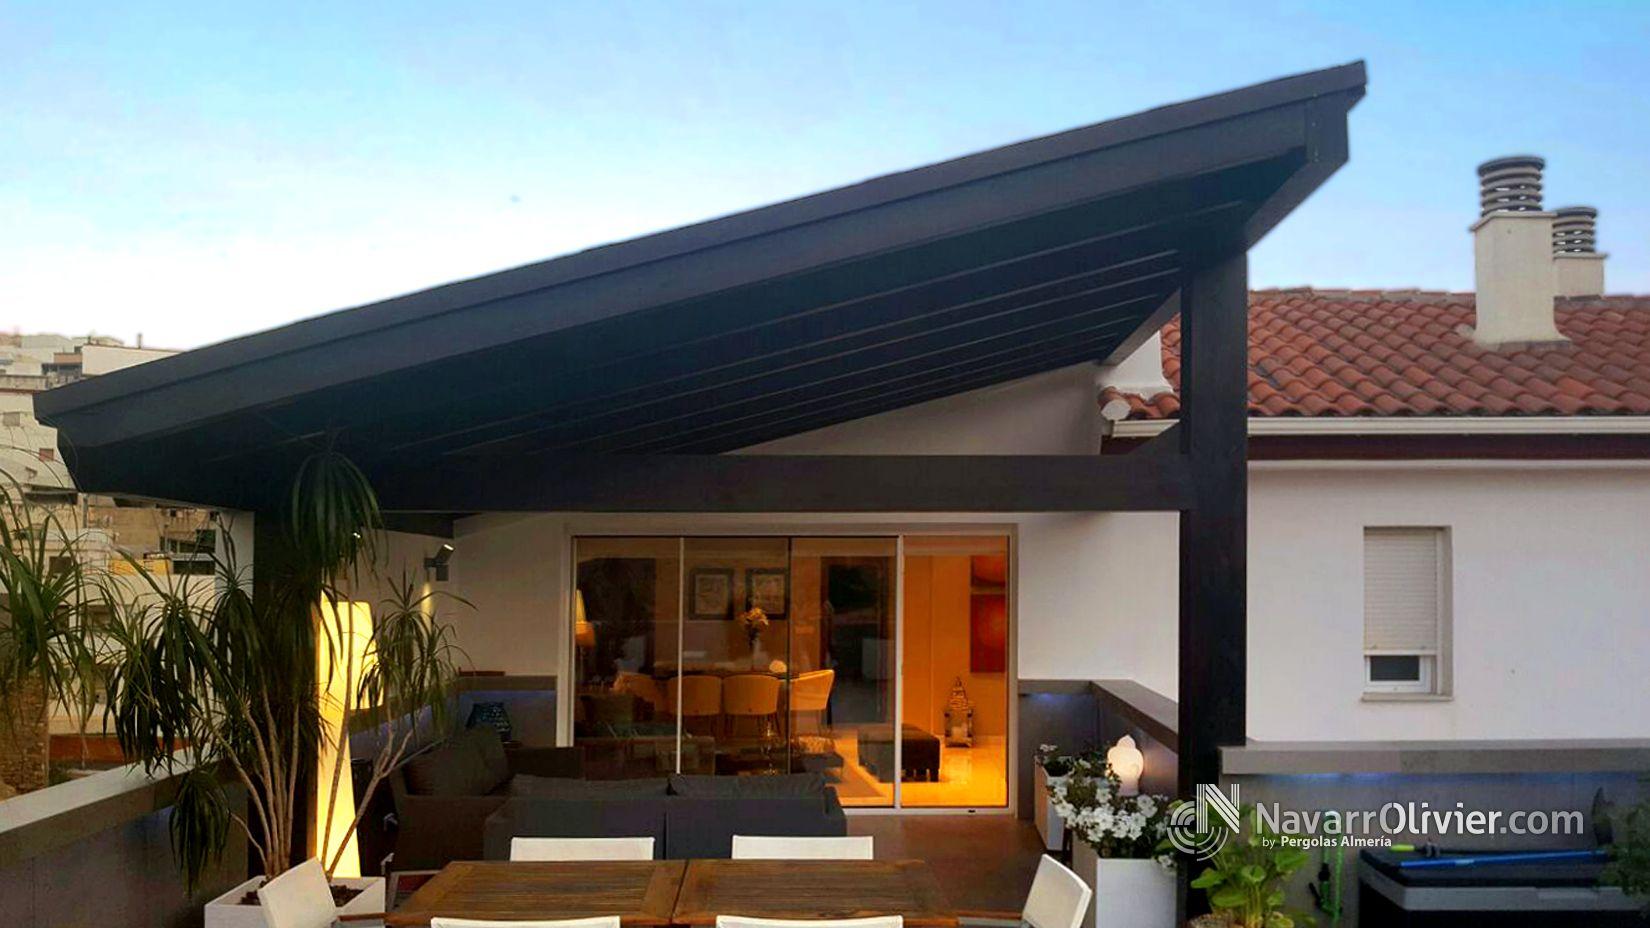 Pin de olivier navarro en p rgolas decor outdoor decor - Pergolas para terraza ...